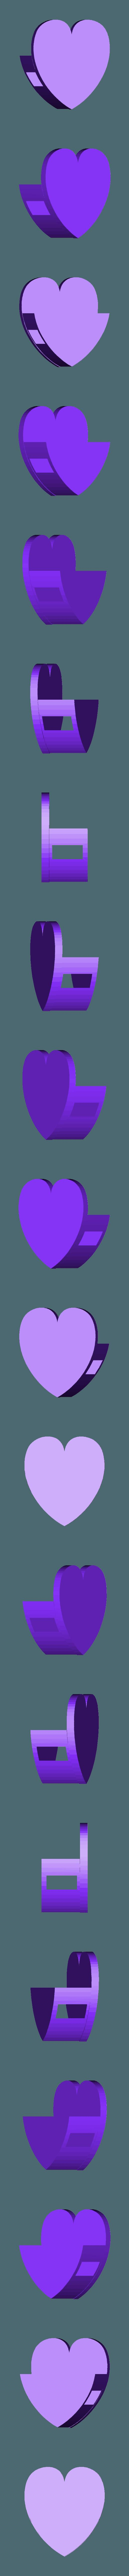 AirpodsCase_HeartBox.STL Download free STL file Mobile Phone Stand & Airpods Heart Box • 3D printer model, mennaelfrash55